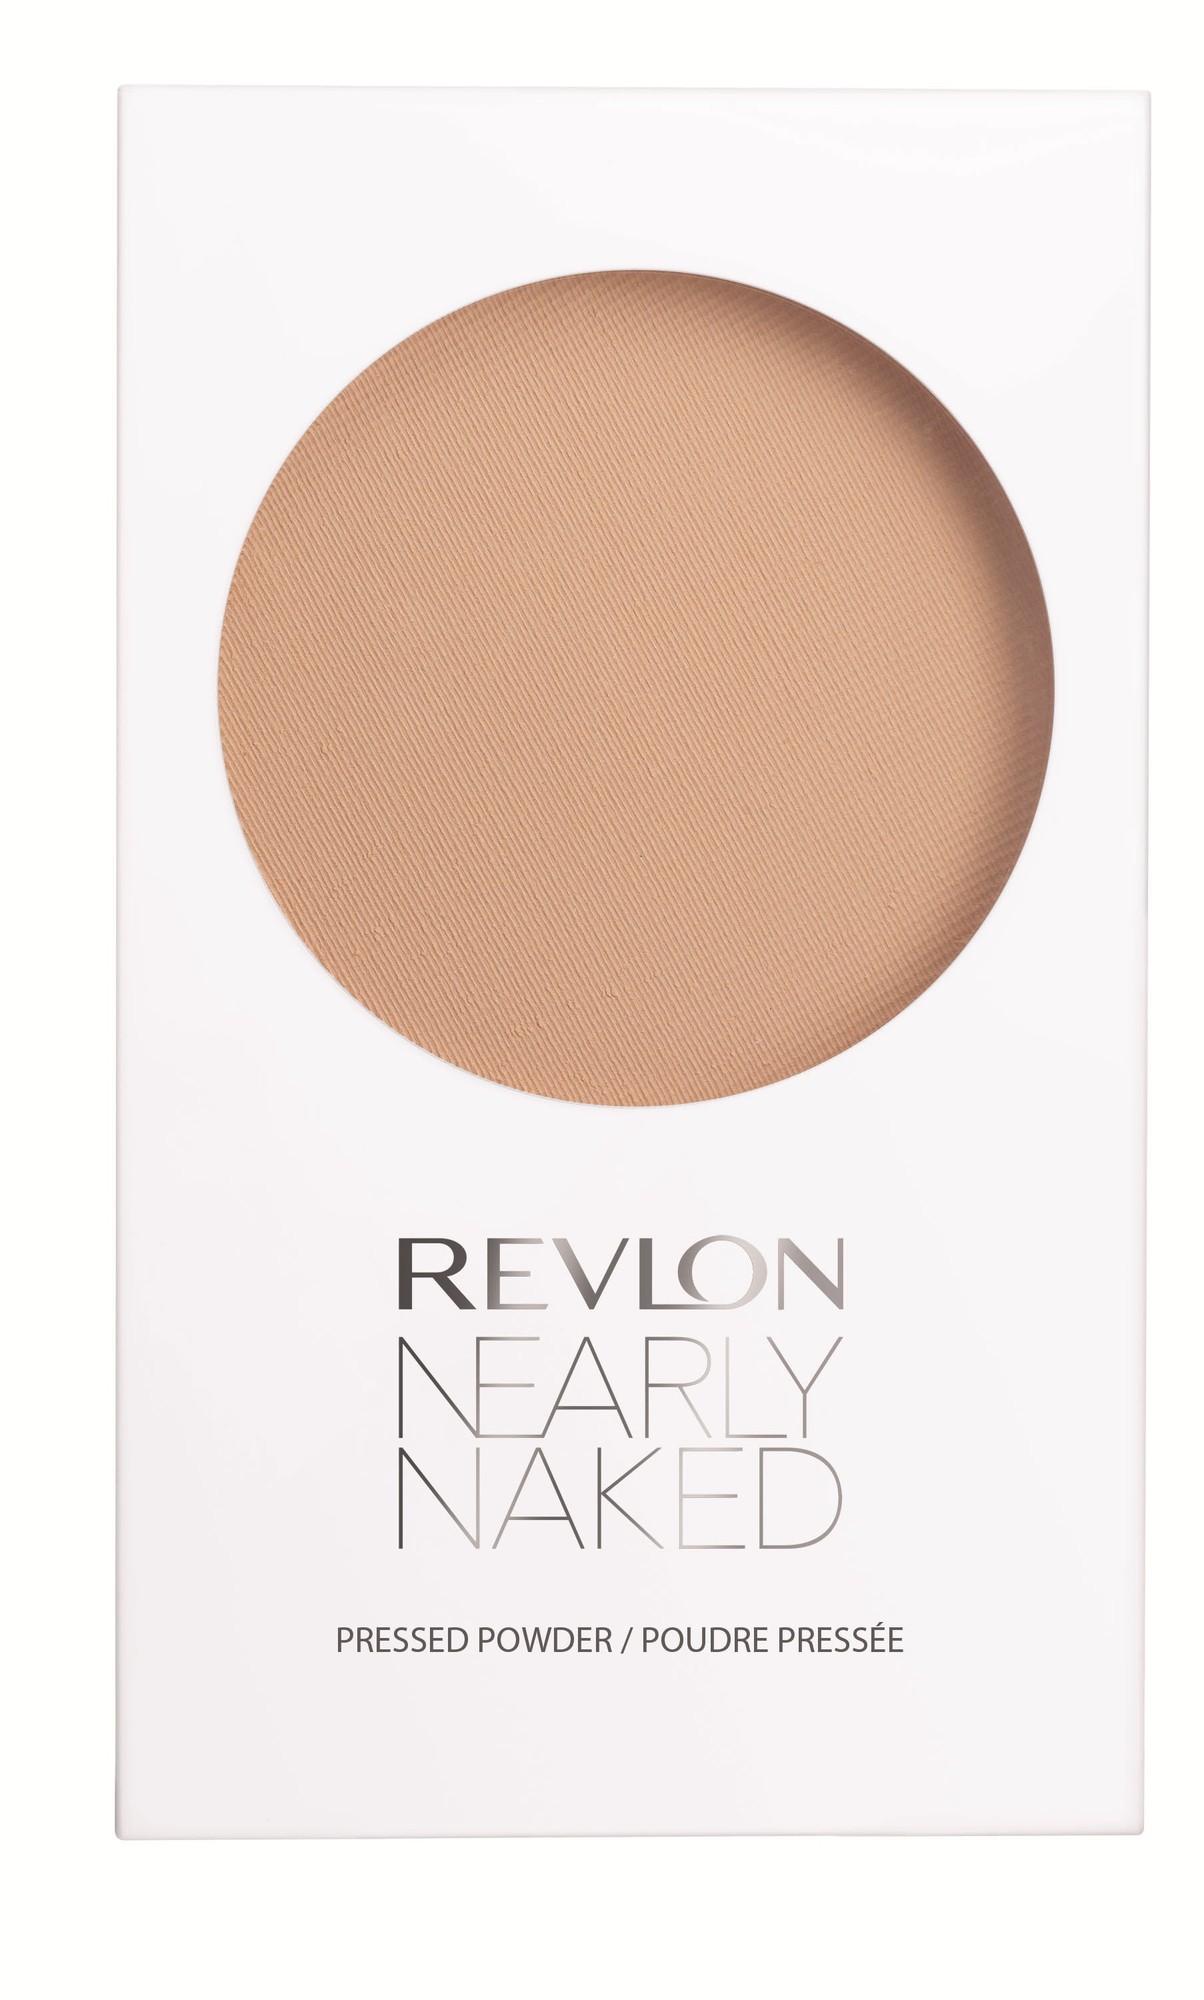 Nearly Naked!